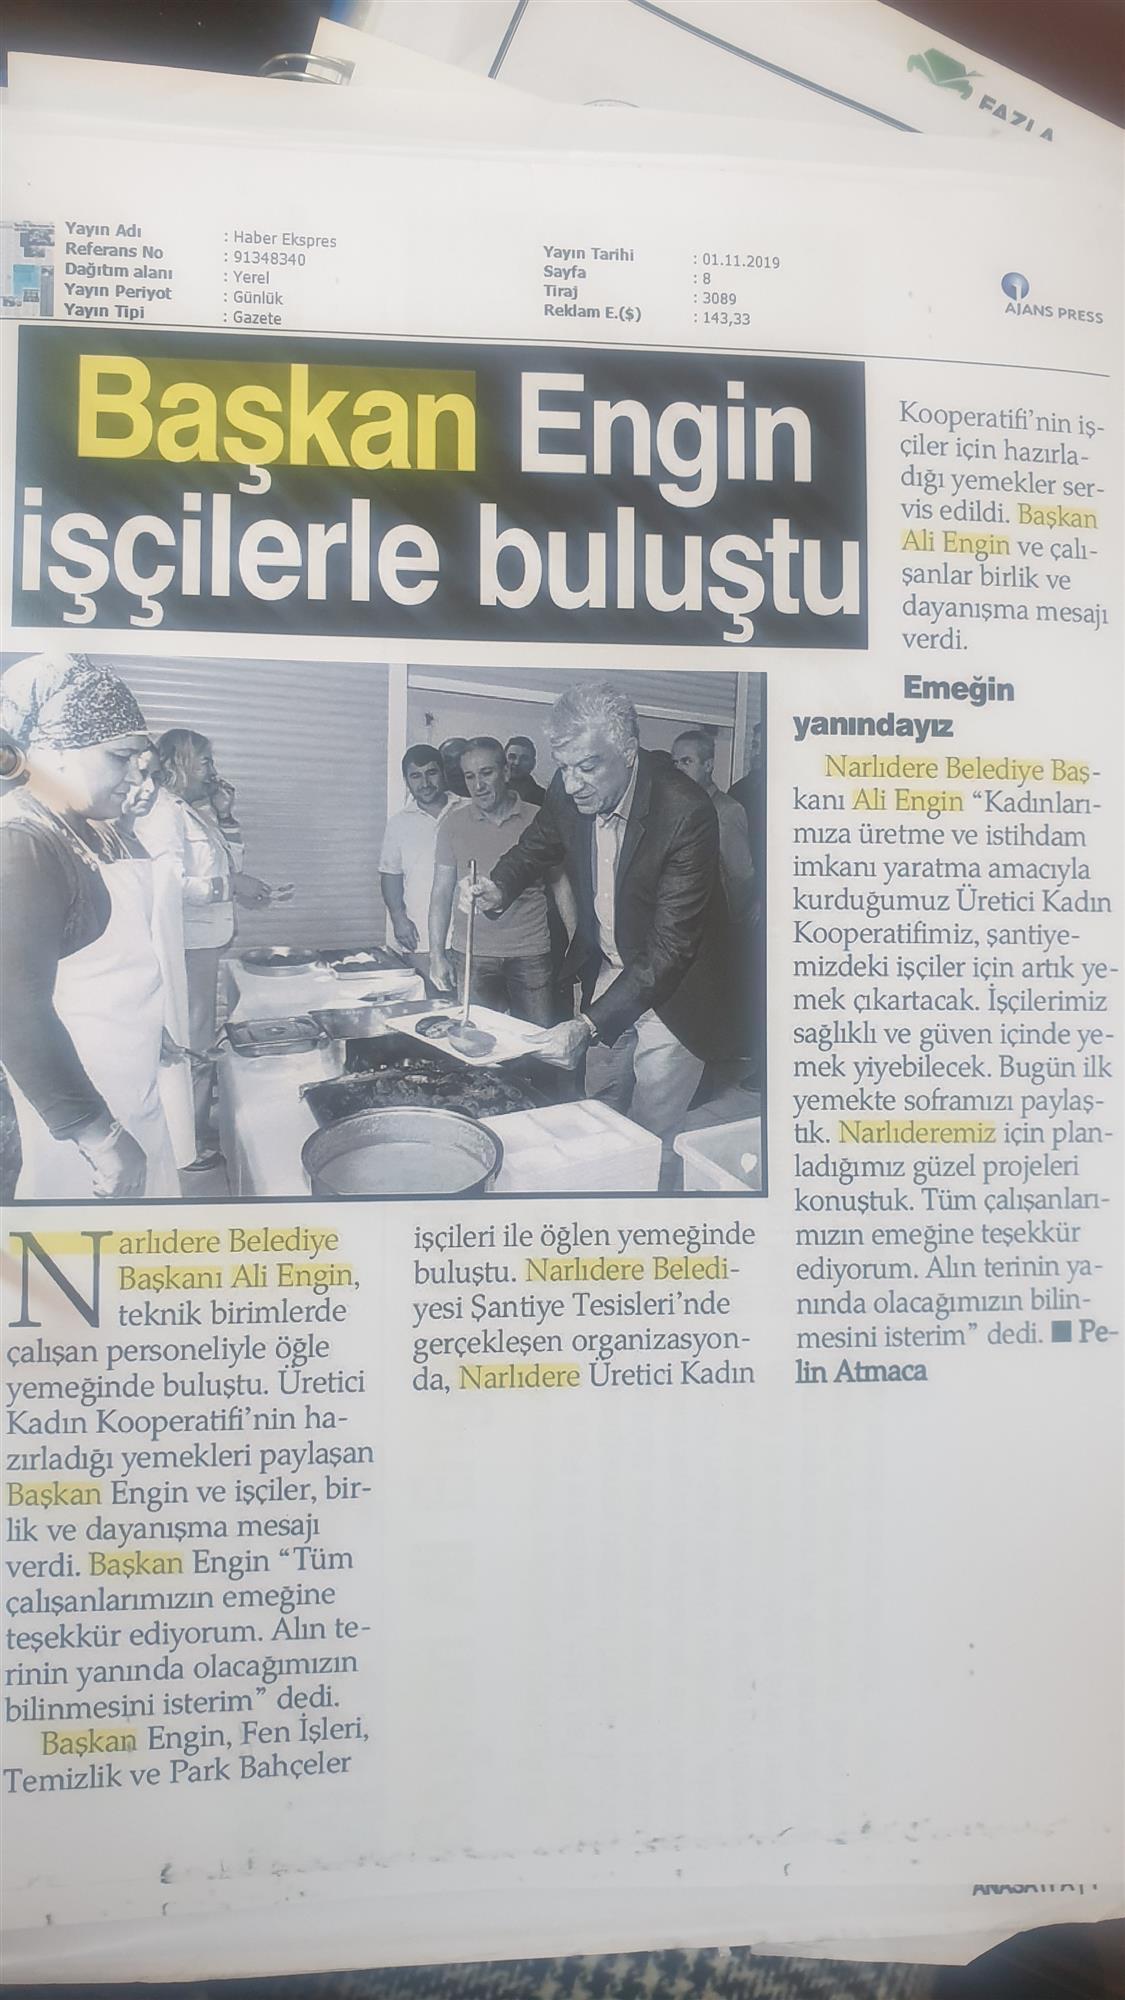 gazete-haberleri20201281687935